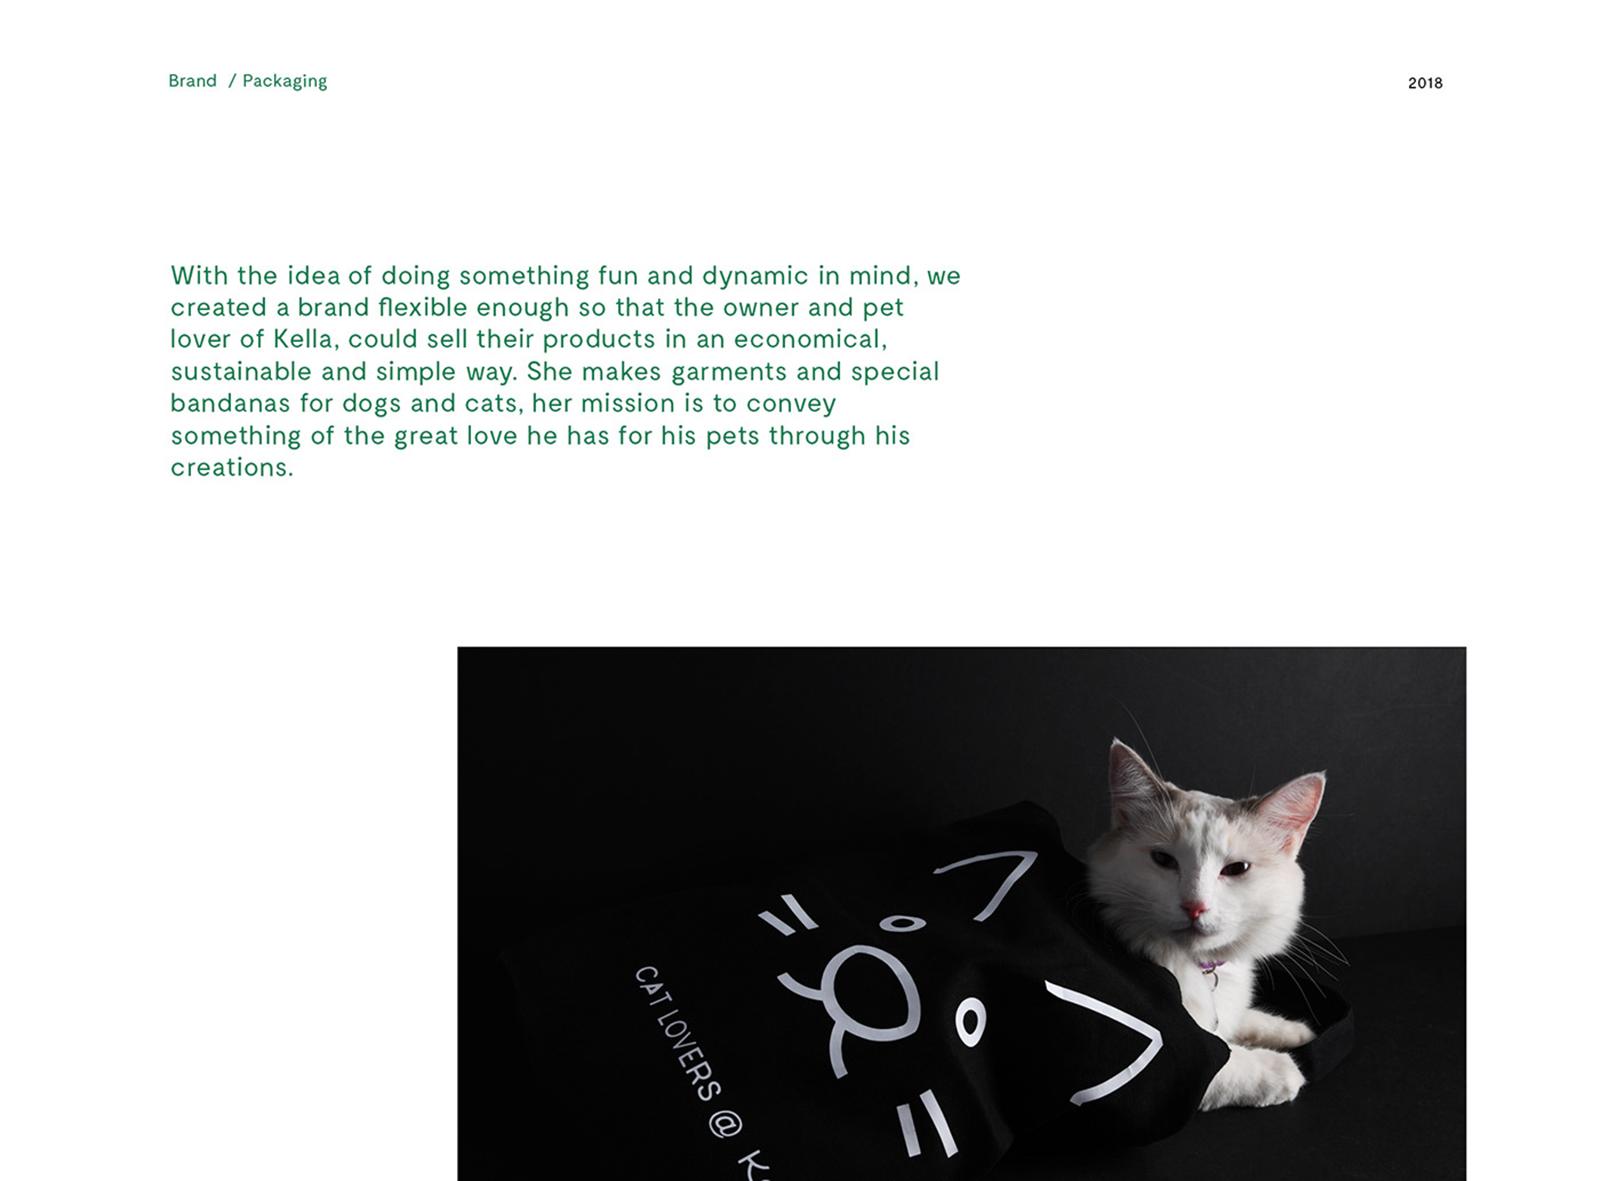 Kella宠物食品品牌视觉VI形象设计欣赏-深圳VI设计